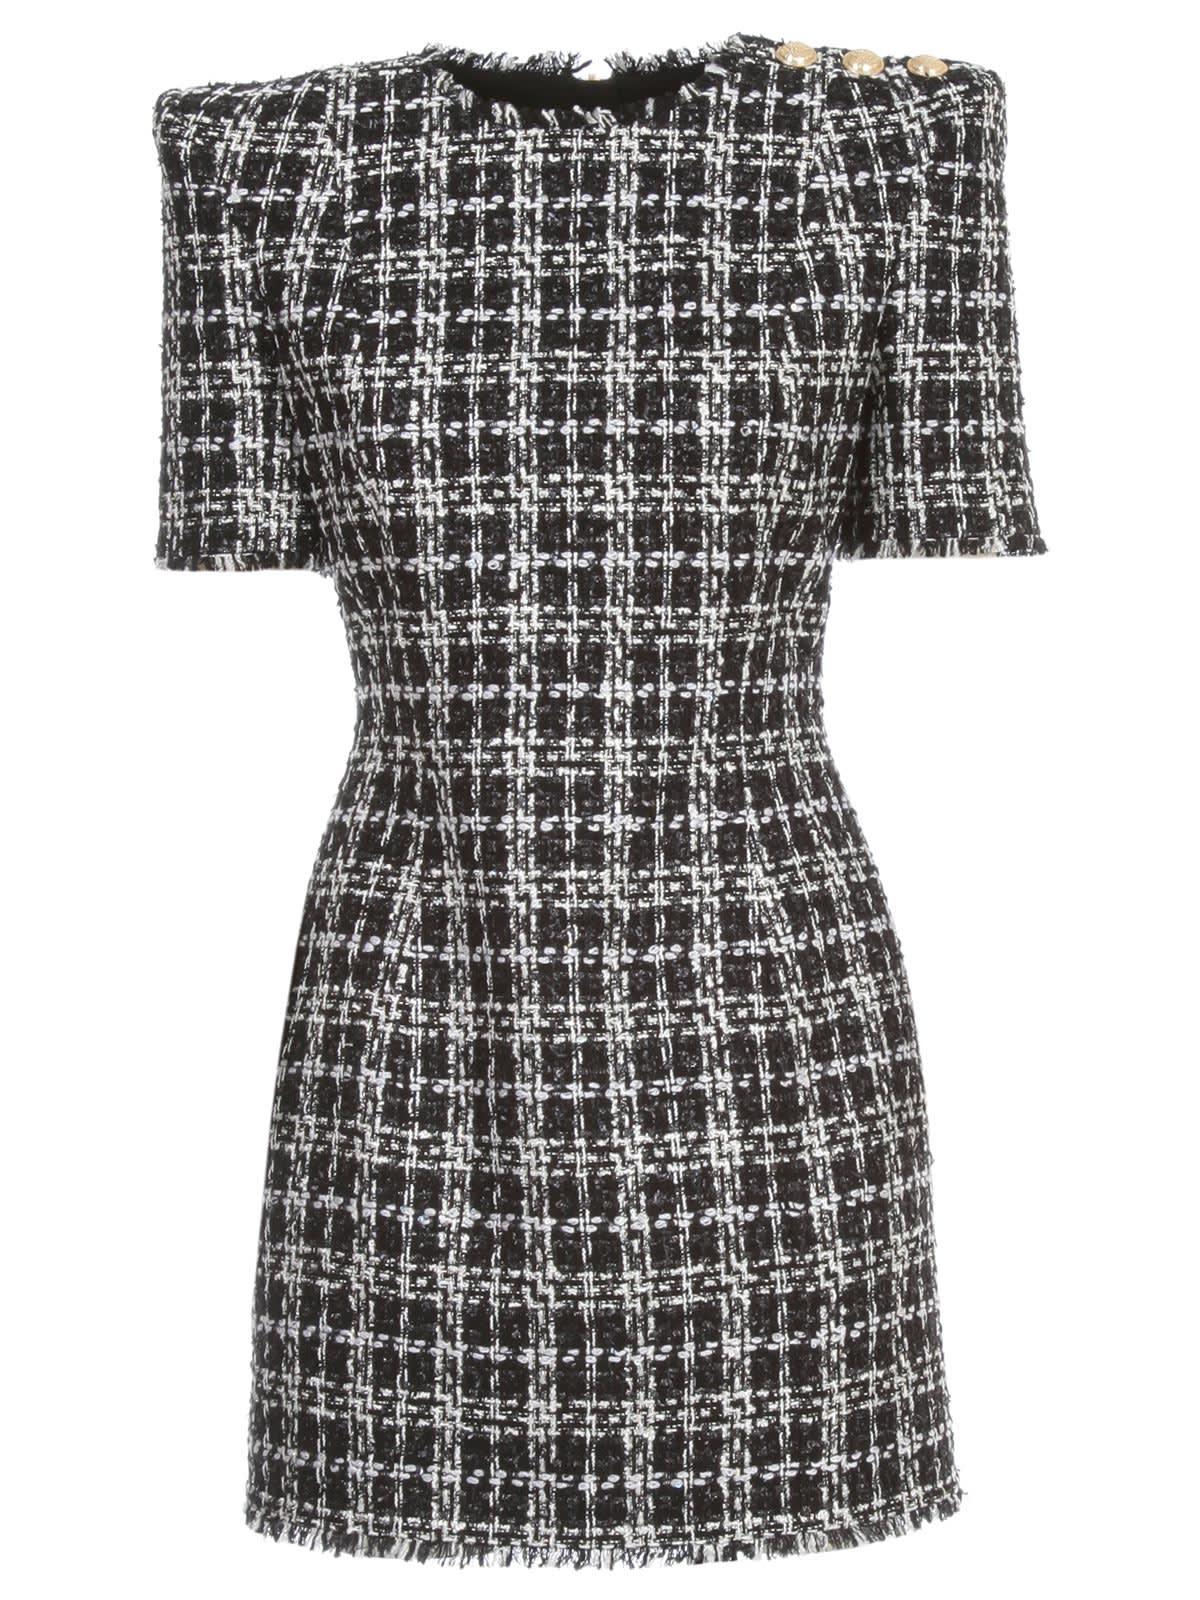 Buy Balmain Dress S/s Short Lurex Tweed online, shop Balmain with free shipping